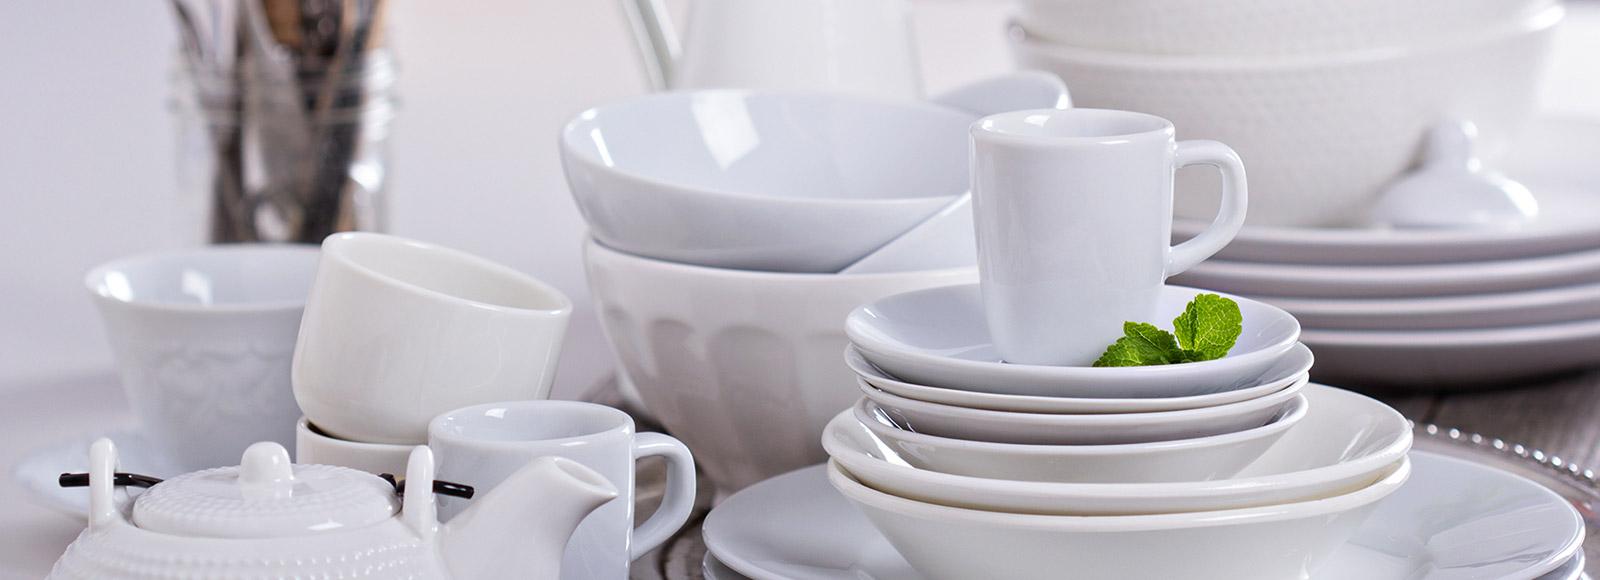 restaurant plates bowls mugs